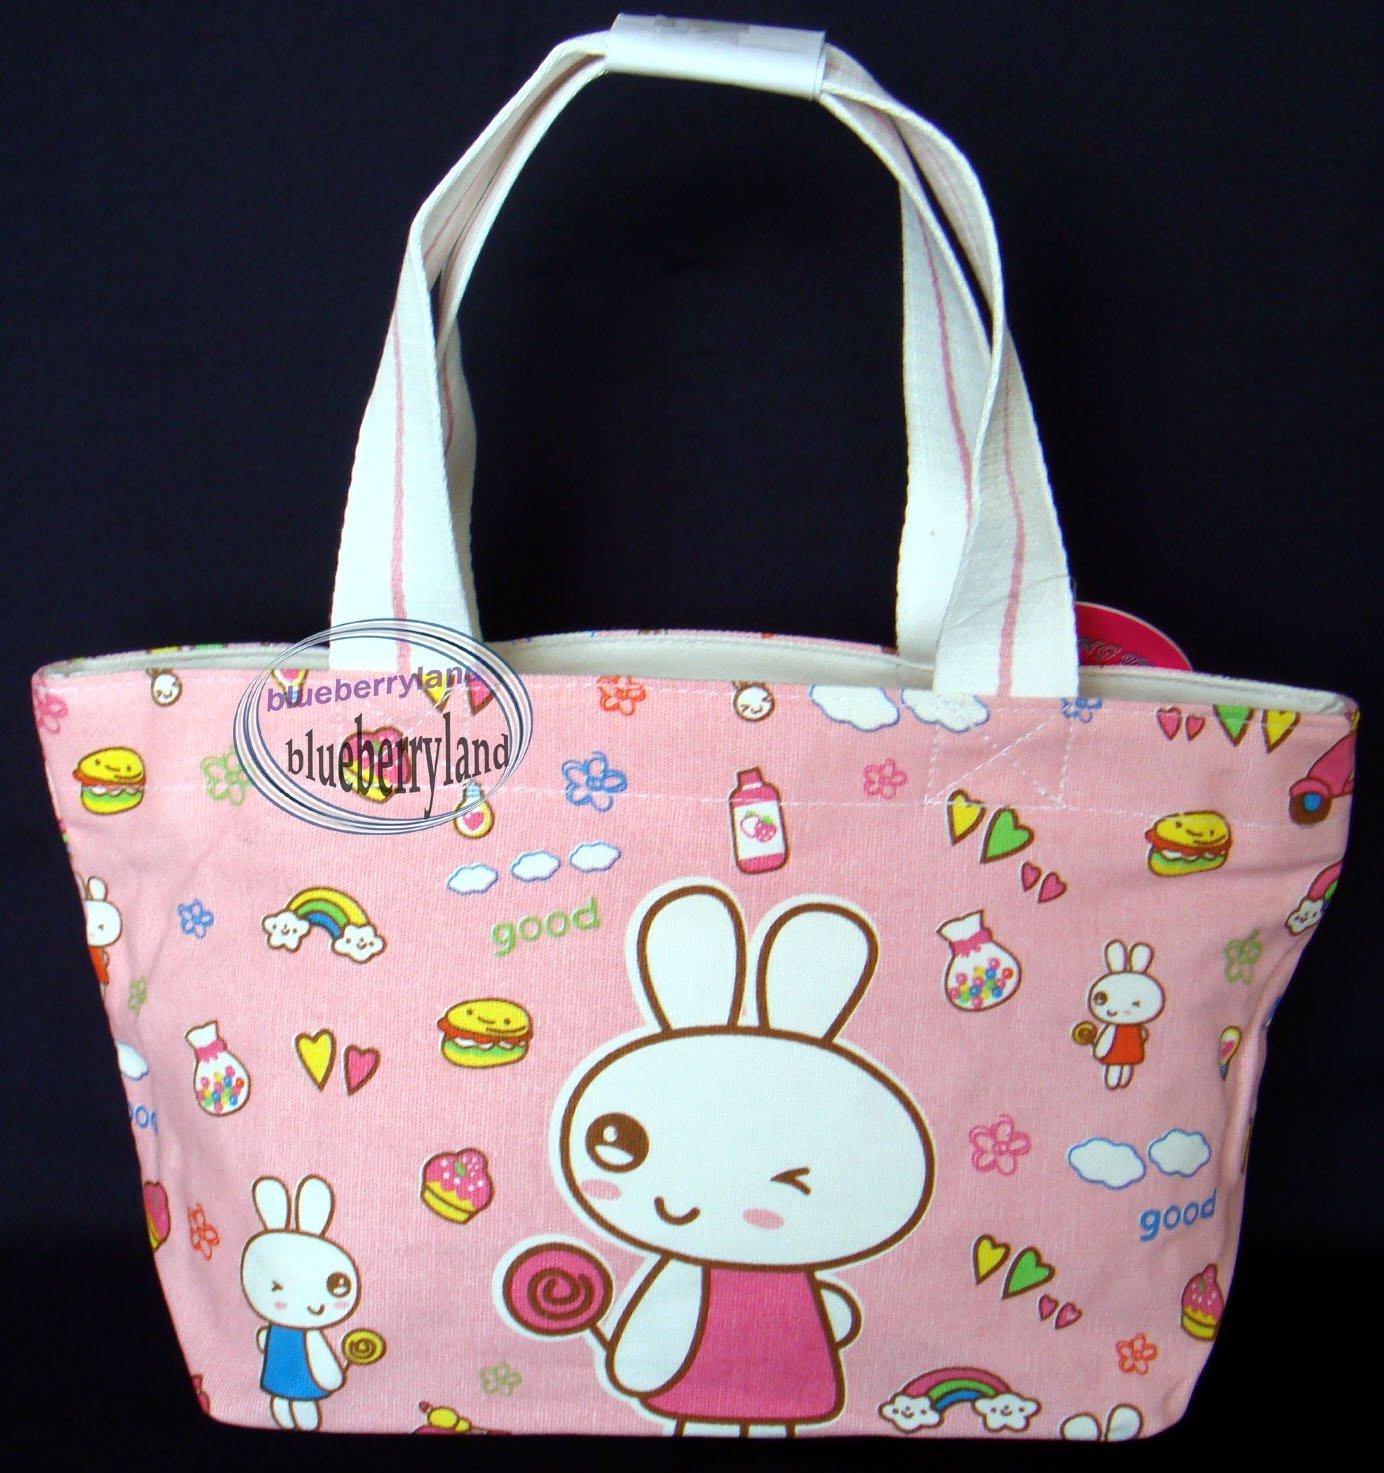 School Sports Beach Weekend Tote BAG purse Handbag Pink